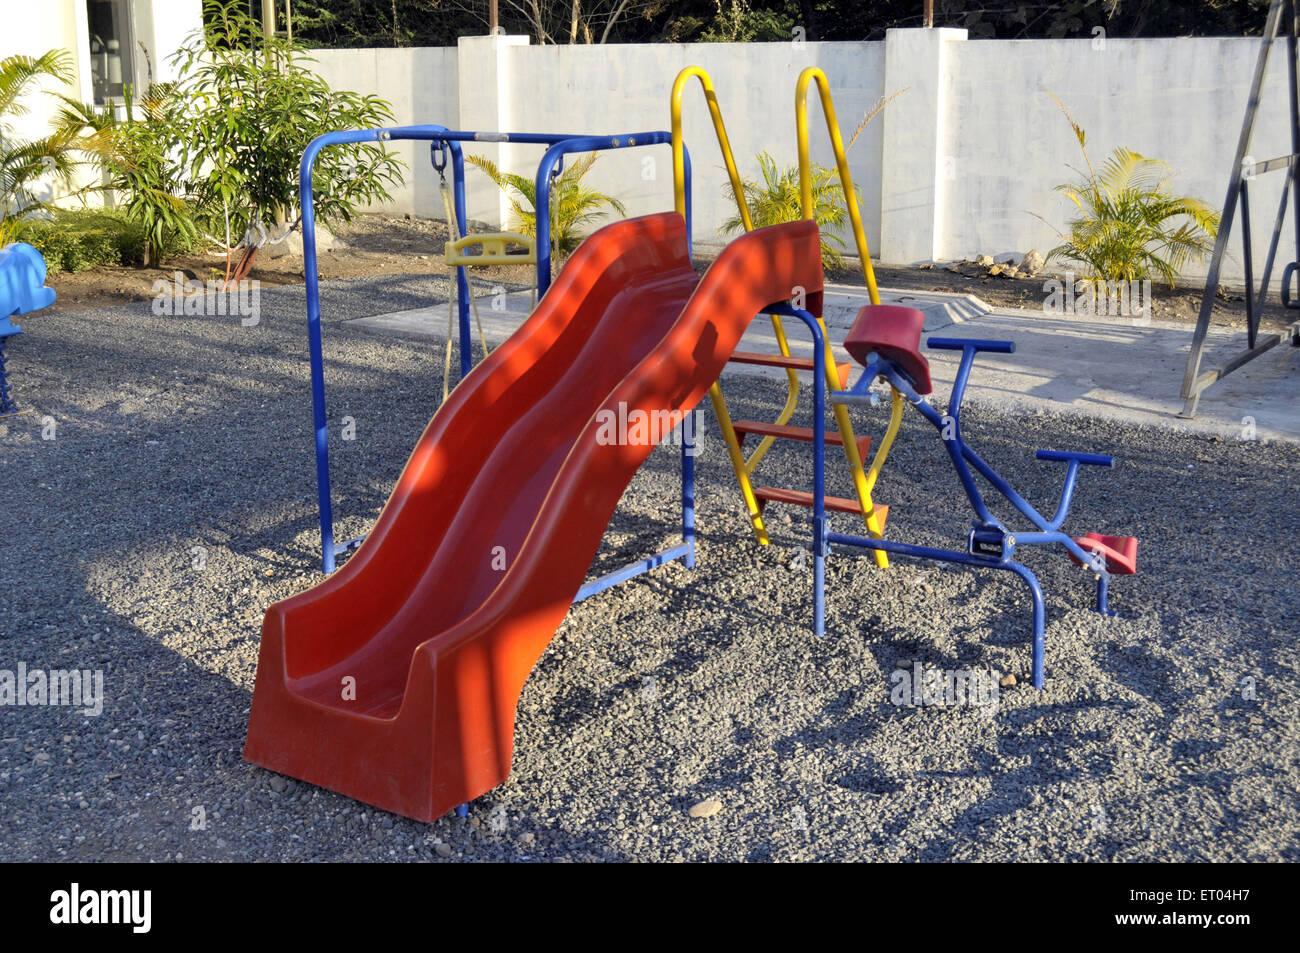 Slide in playground Gir at Gujarat India - Stock Image